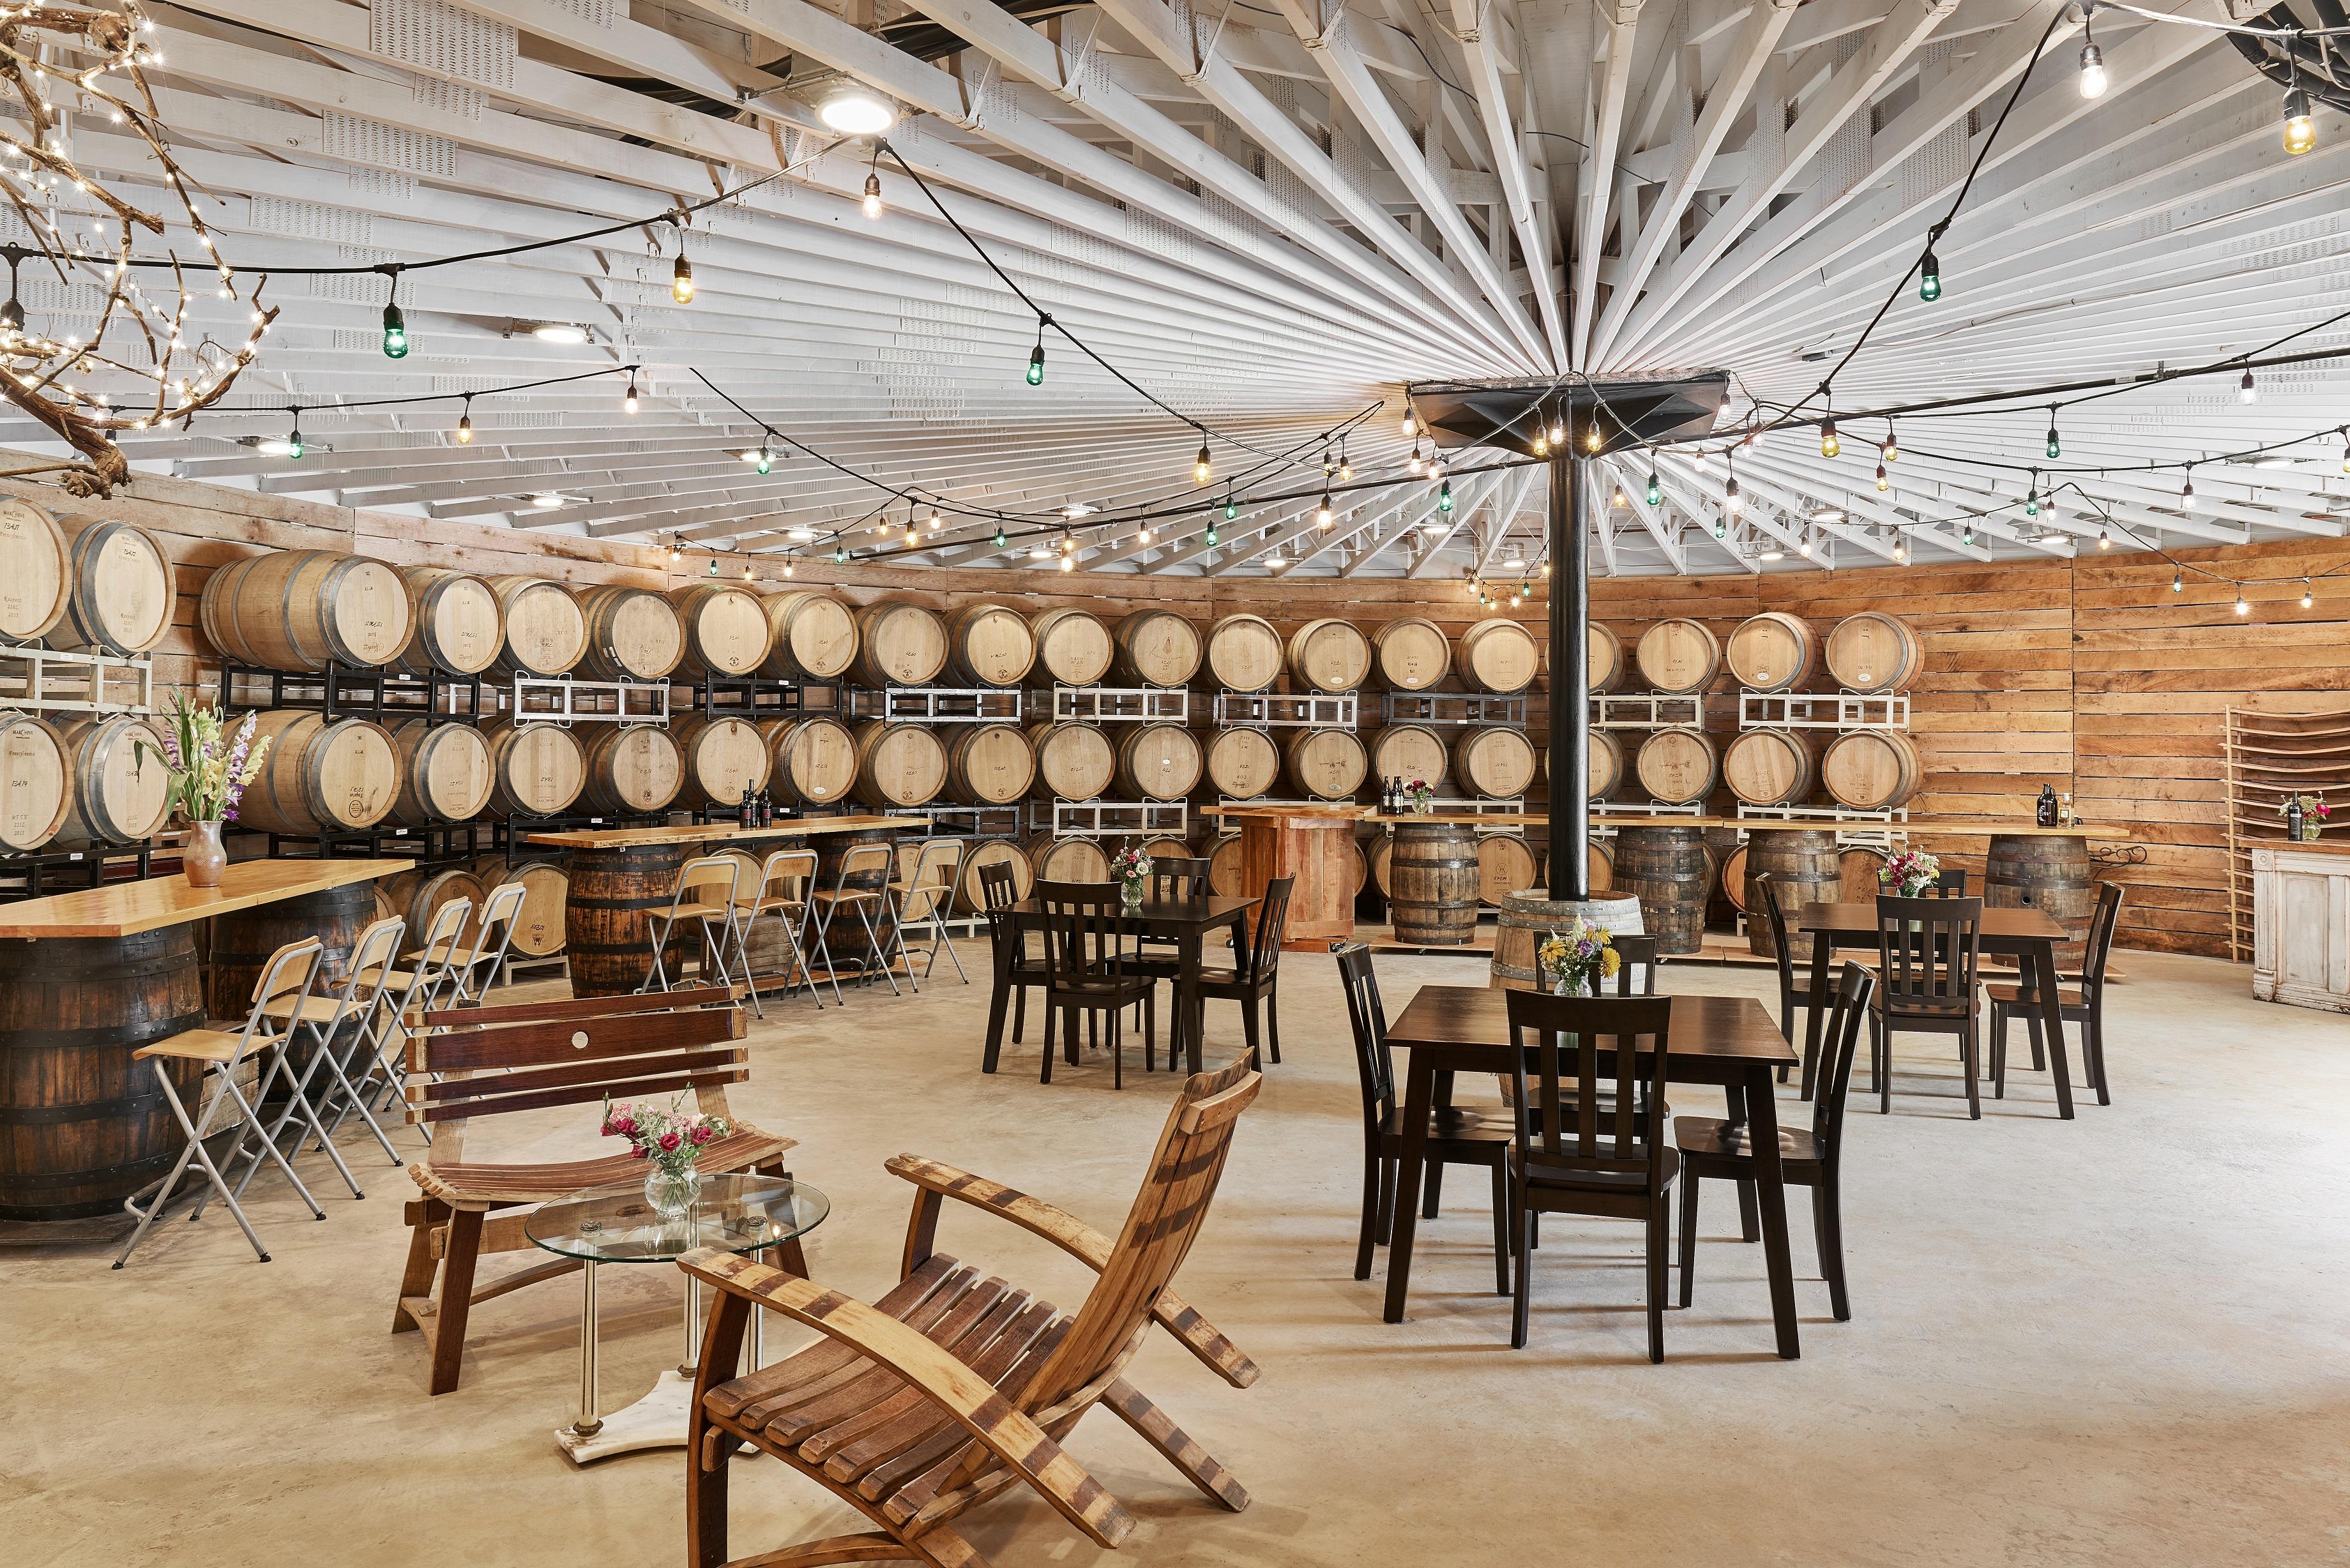 meaux - barrel room